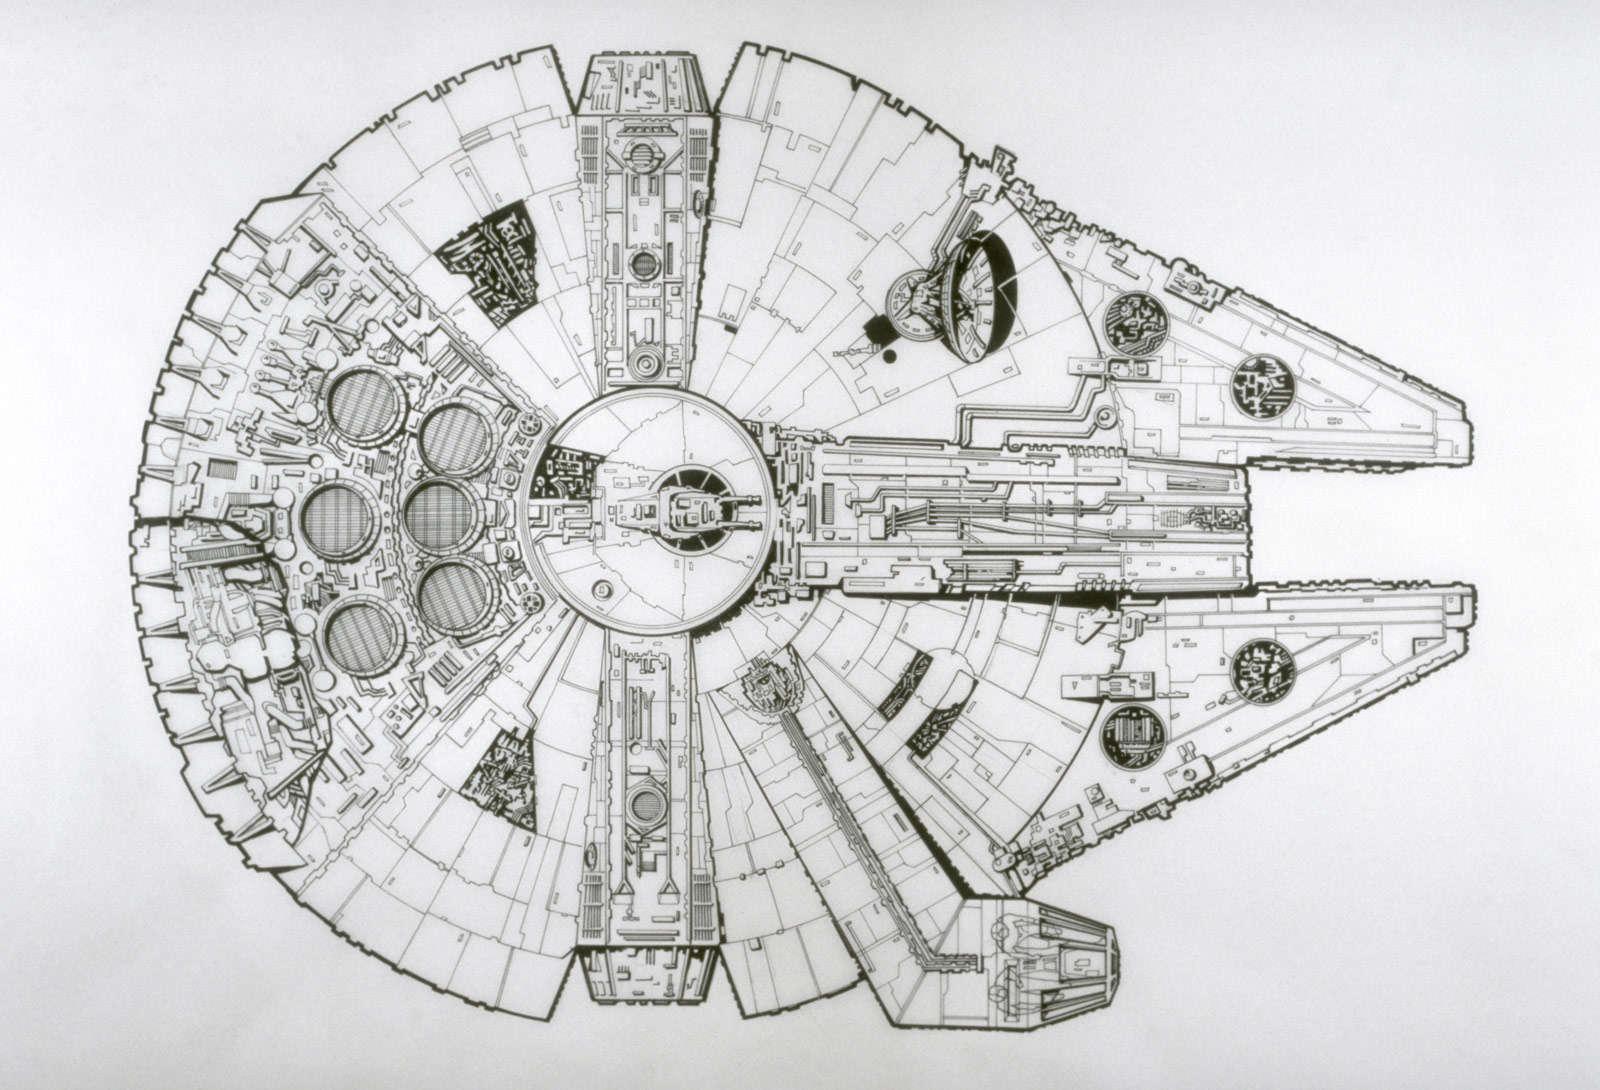 Technical illustration by Joe Johnston